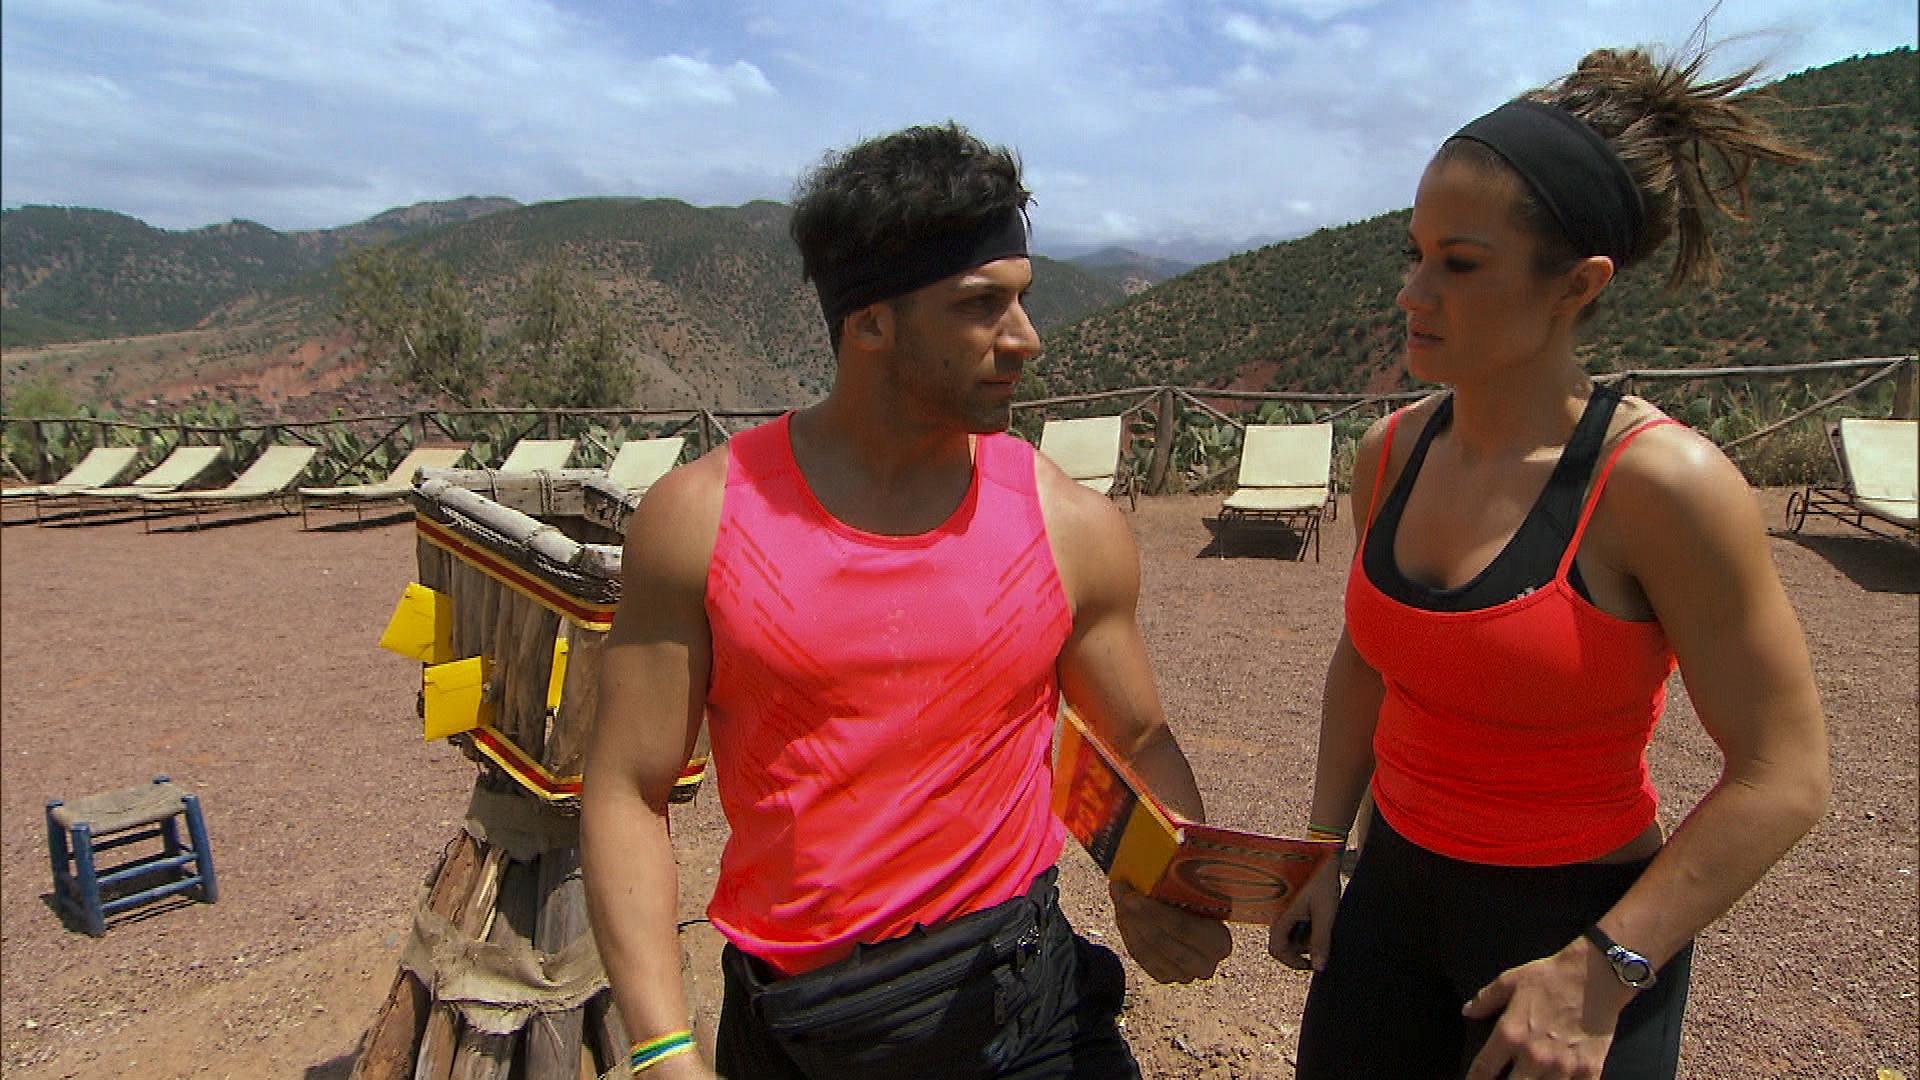 Brooke and Robbie